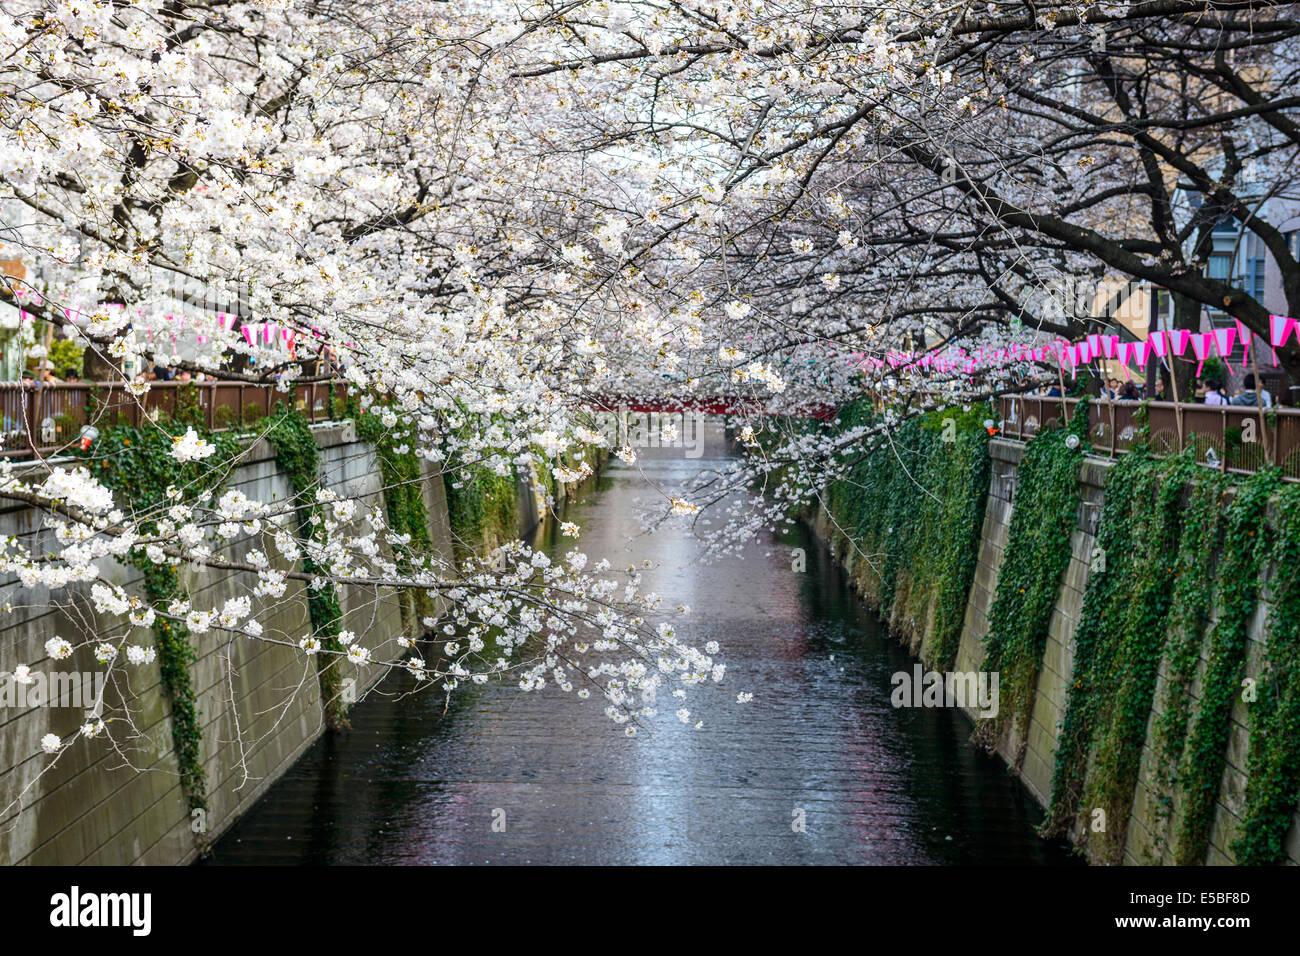 Tokyo, Japan am Meguro-Kanal in die Frühjahrssaison. Stockbild